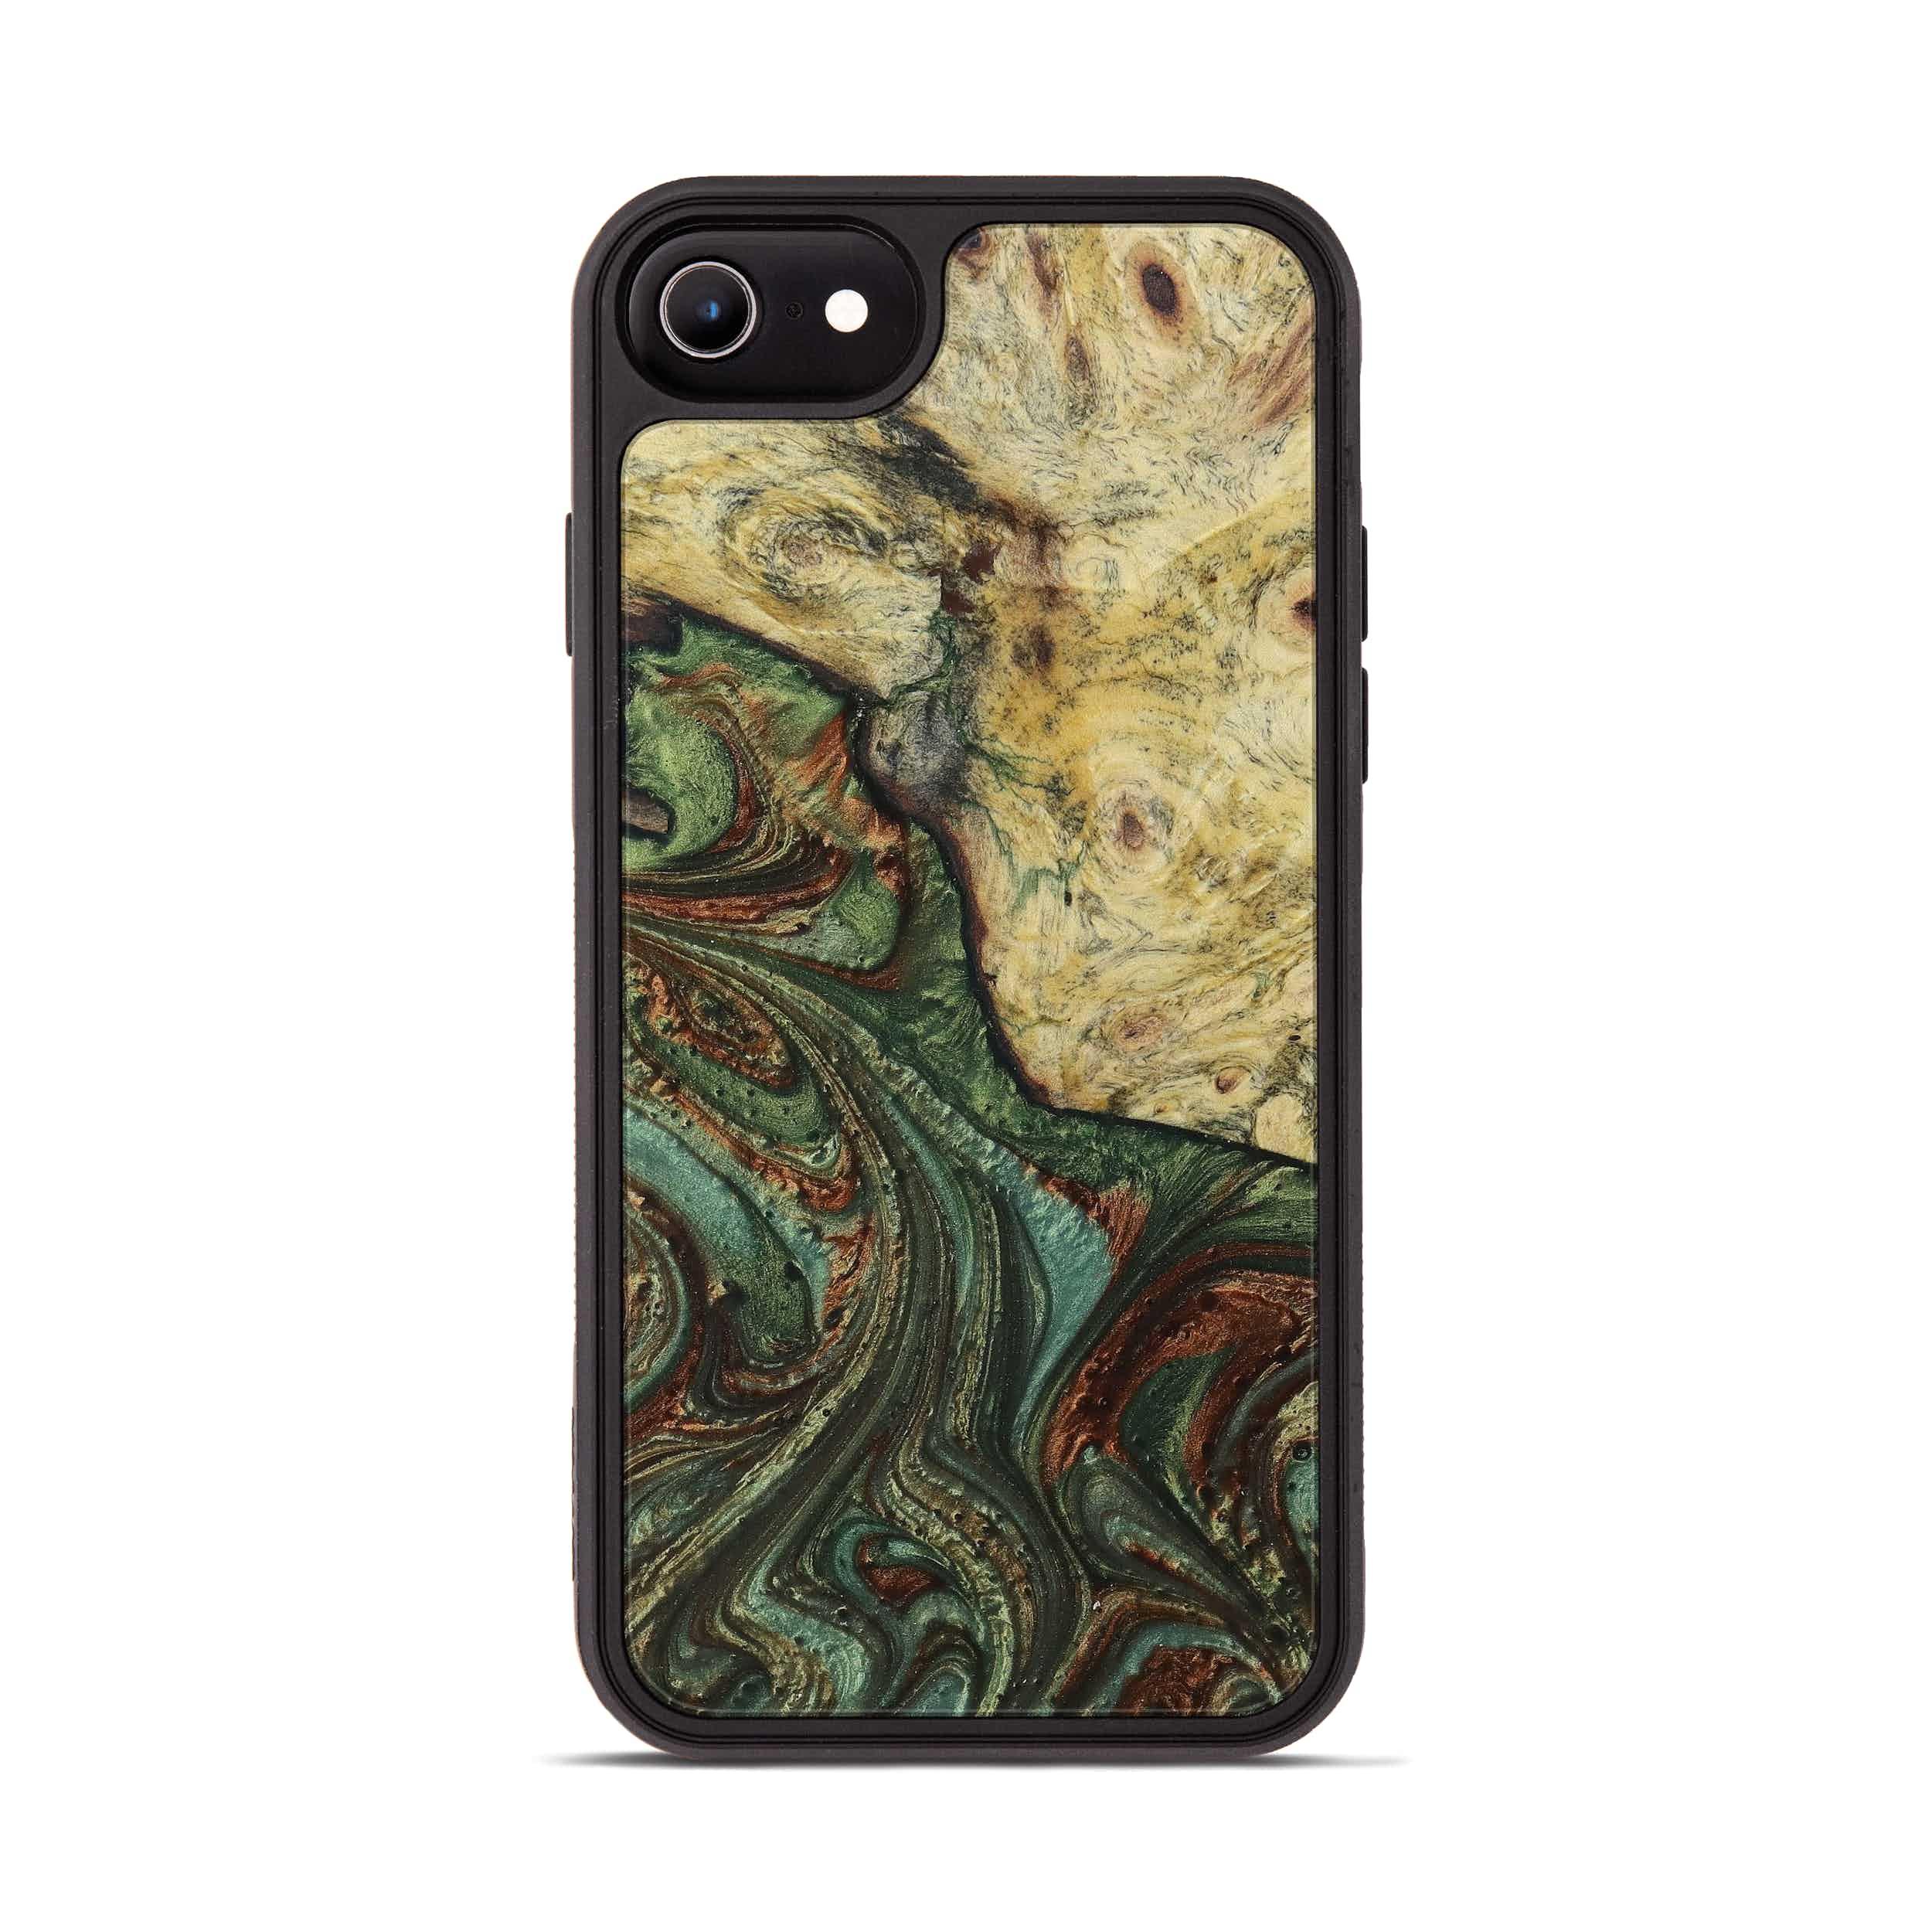 iPhone 6s Wood+Resin Phone Case - Elhamy (Dark Green, 397865)